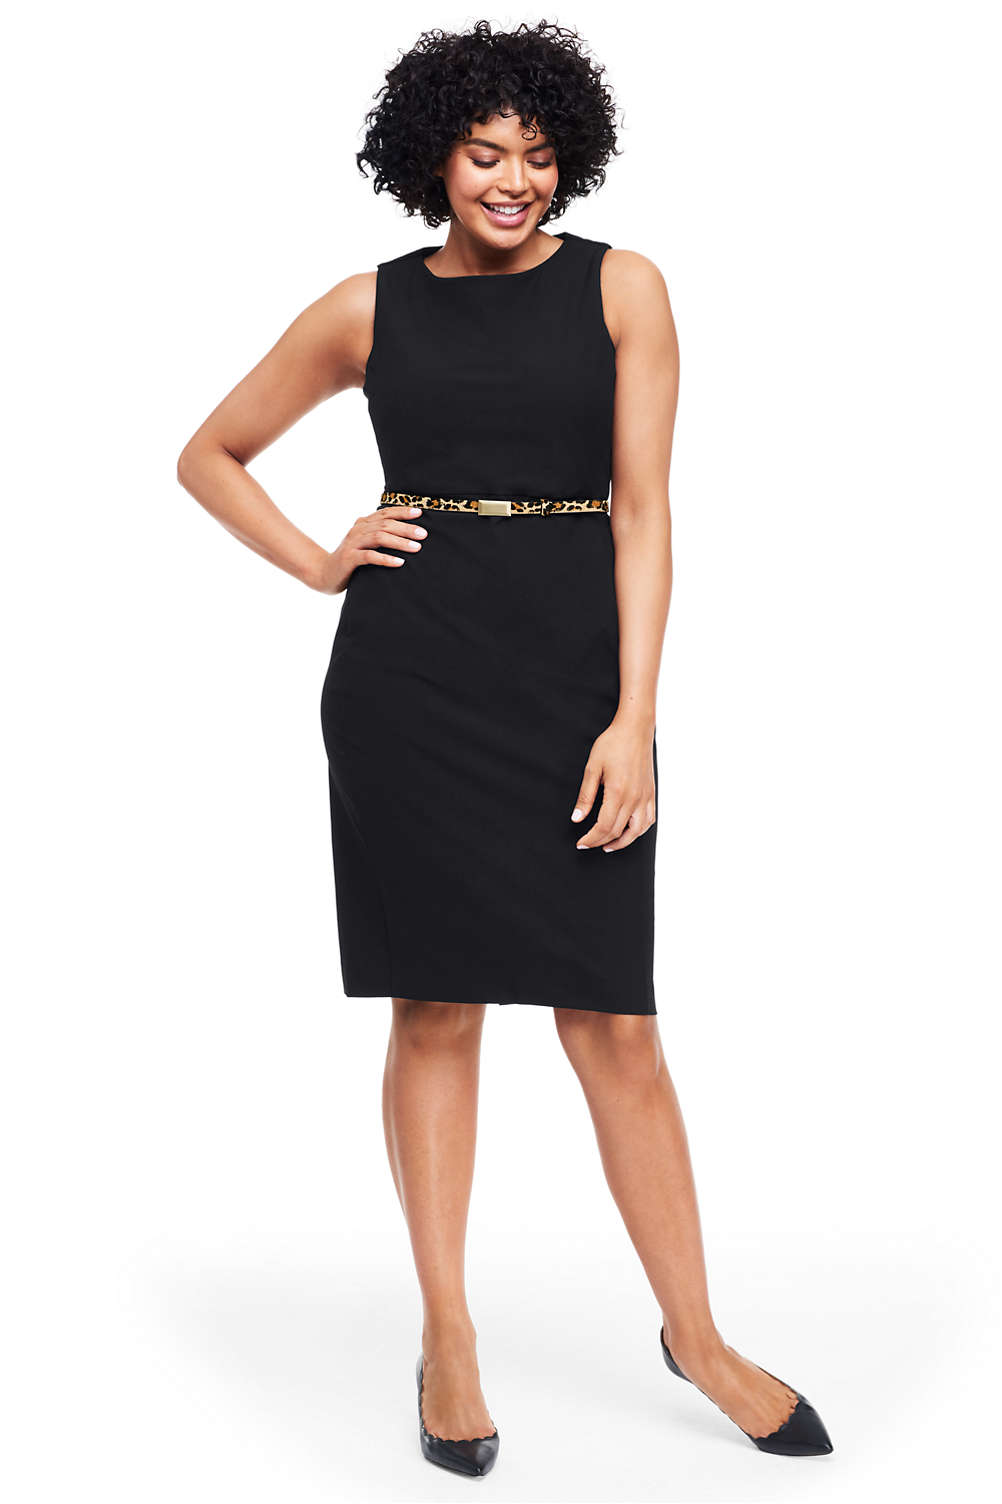 a0d09e91c88 Women s Plus Size Wear to Work Sheath Dress from Lands  End